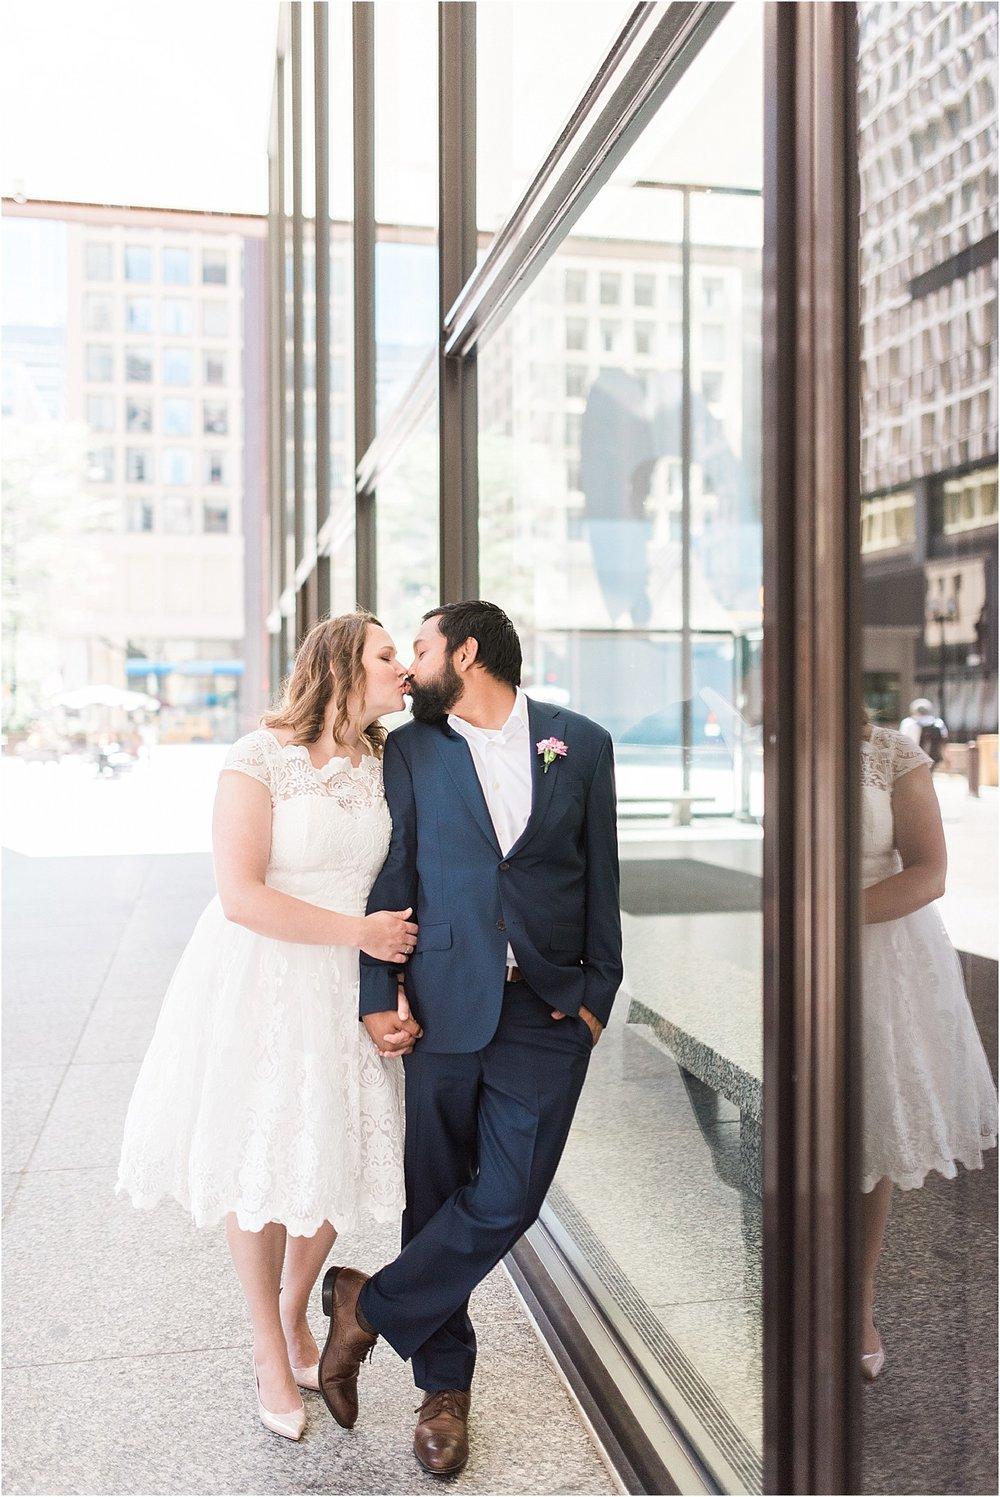 lish-marie-photography-wedding-photographer-chicago_0104.jpg